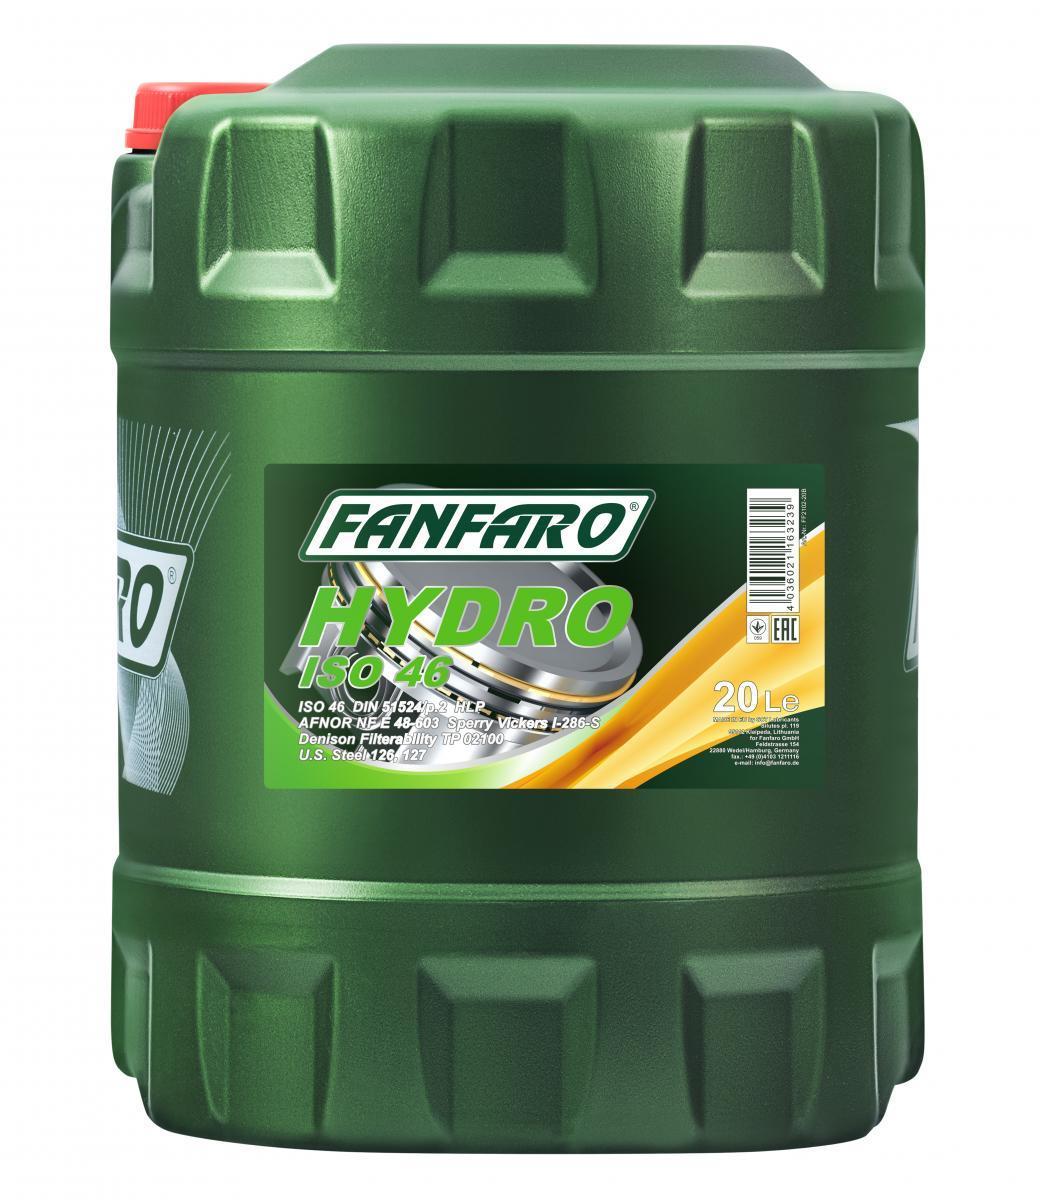 LKW Hydrauliköl FANFARO FF2102-20 kaufen